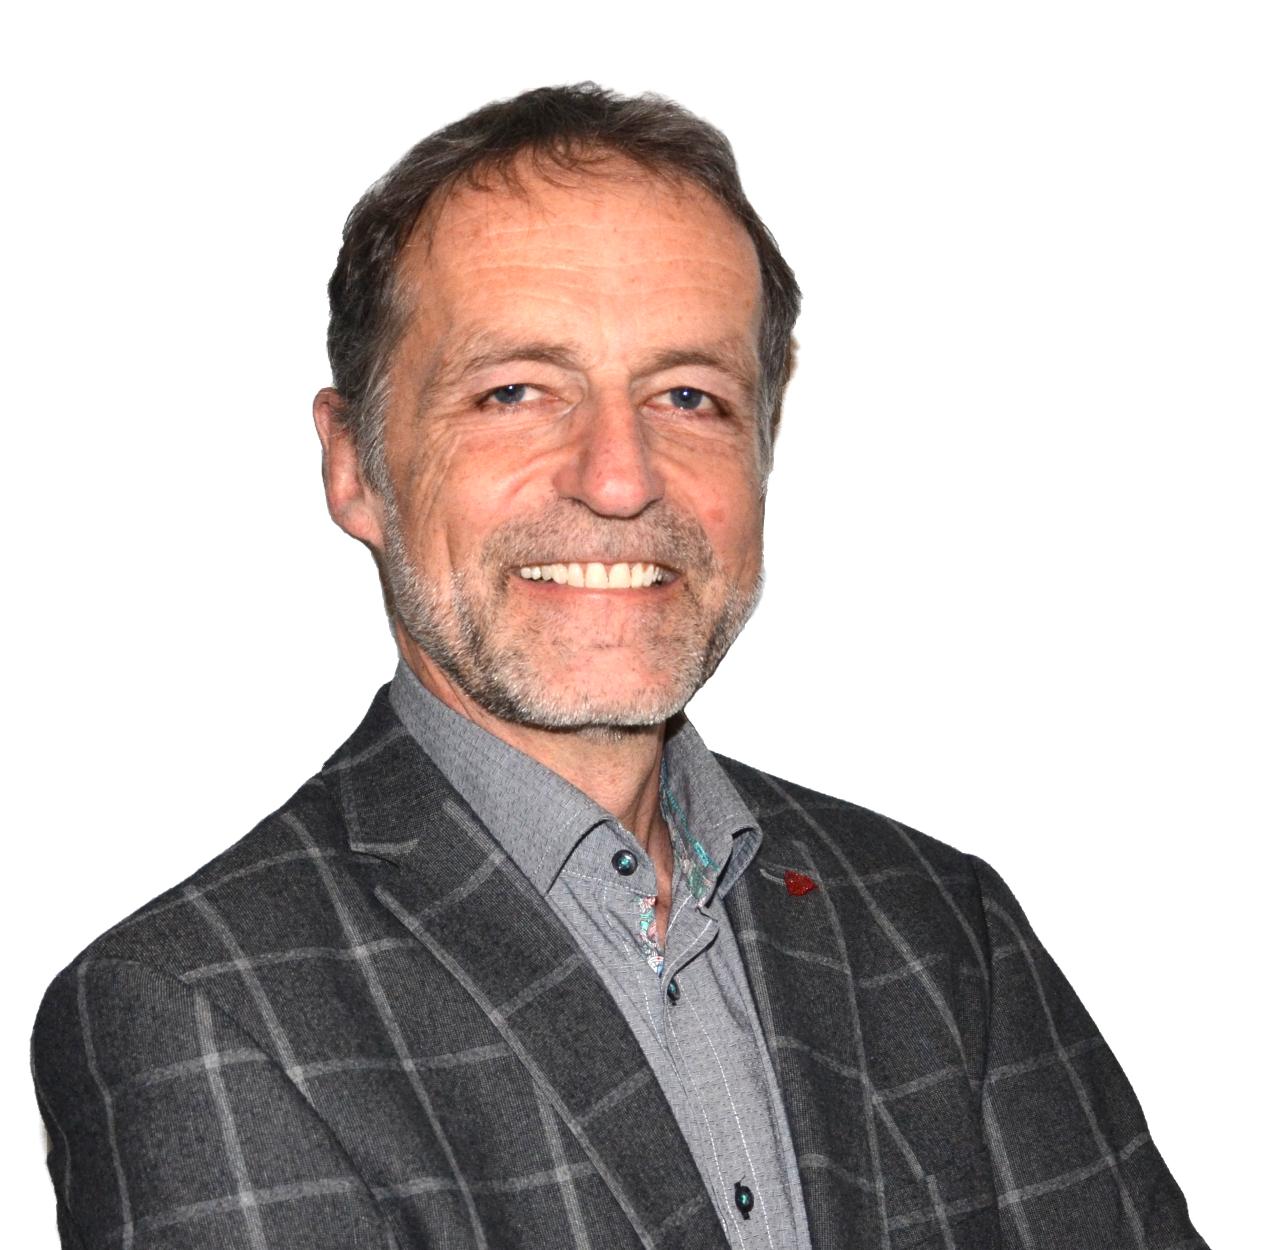 Martin Neuenschwander